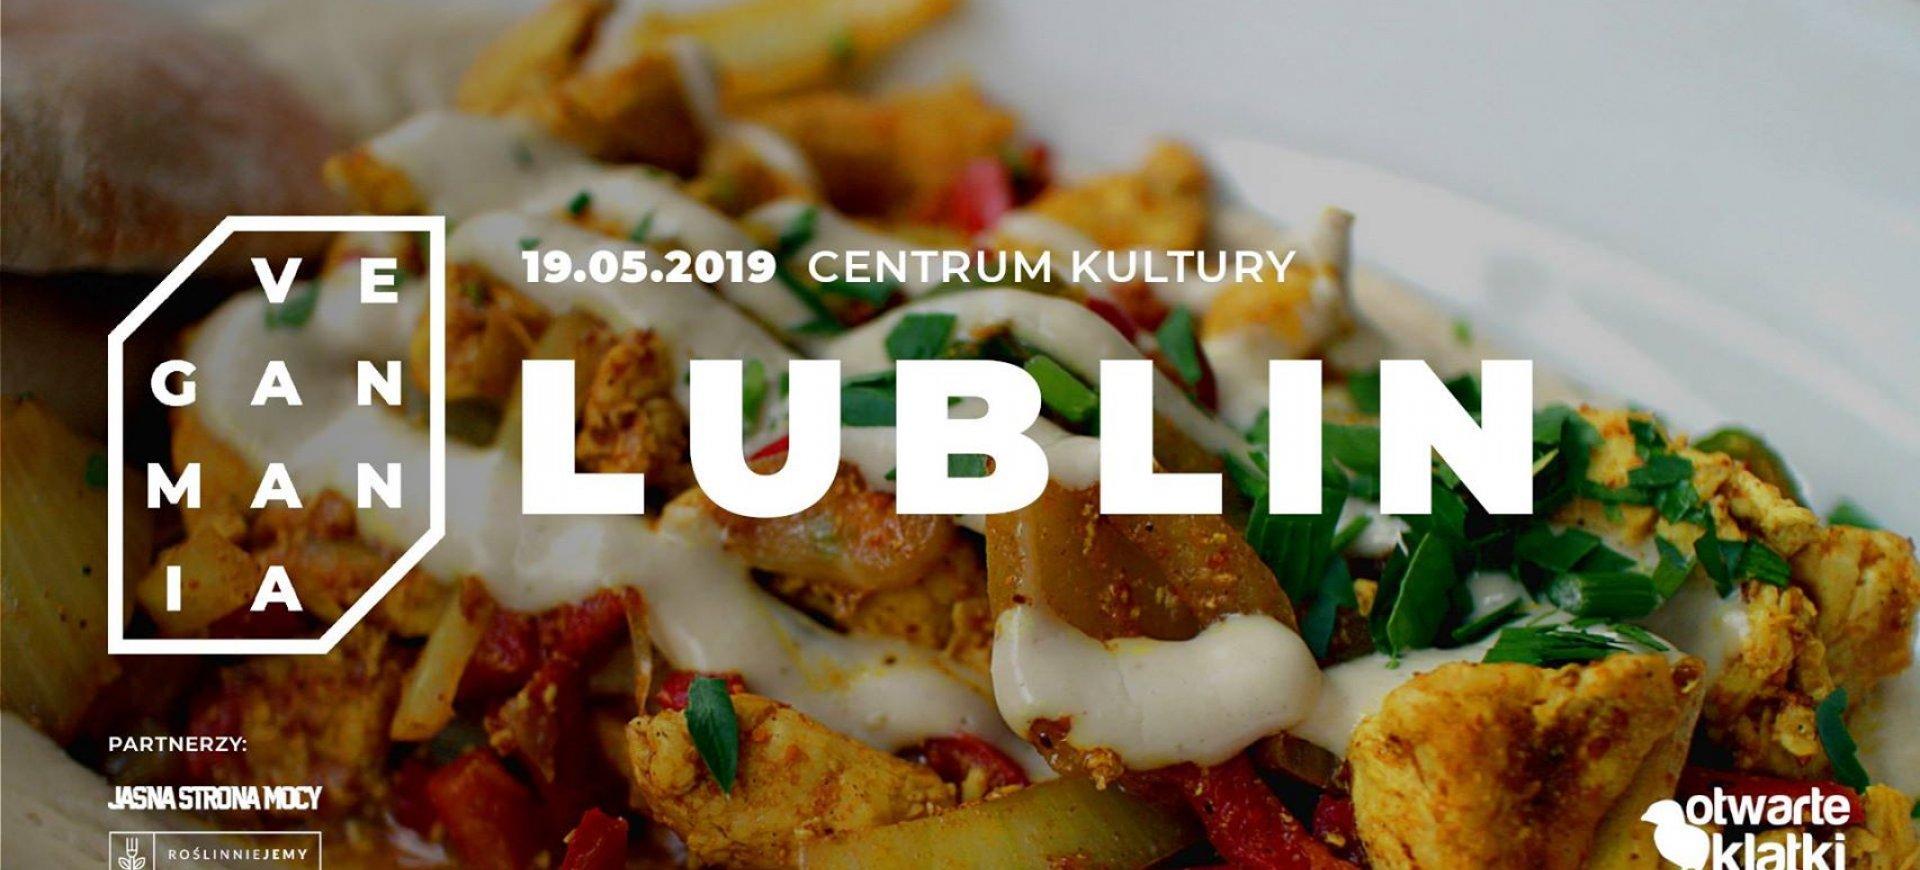 Veganmania Lublin 2019